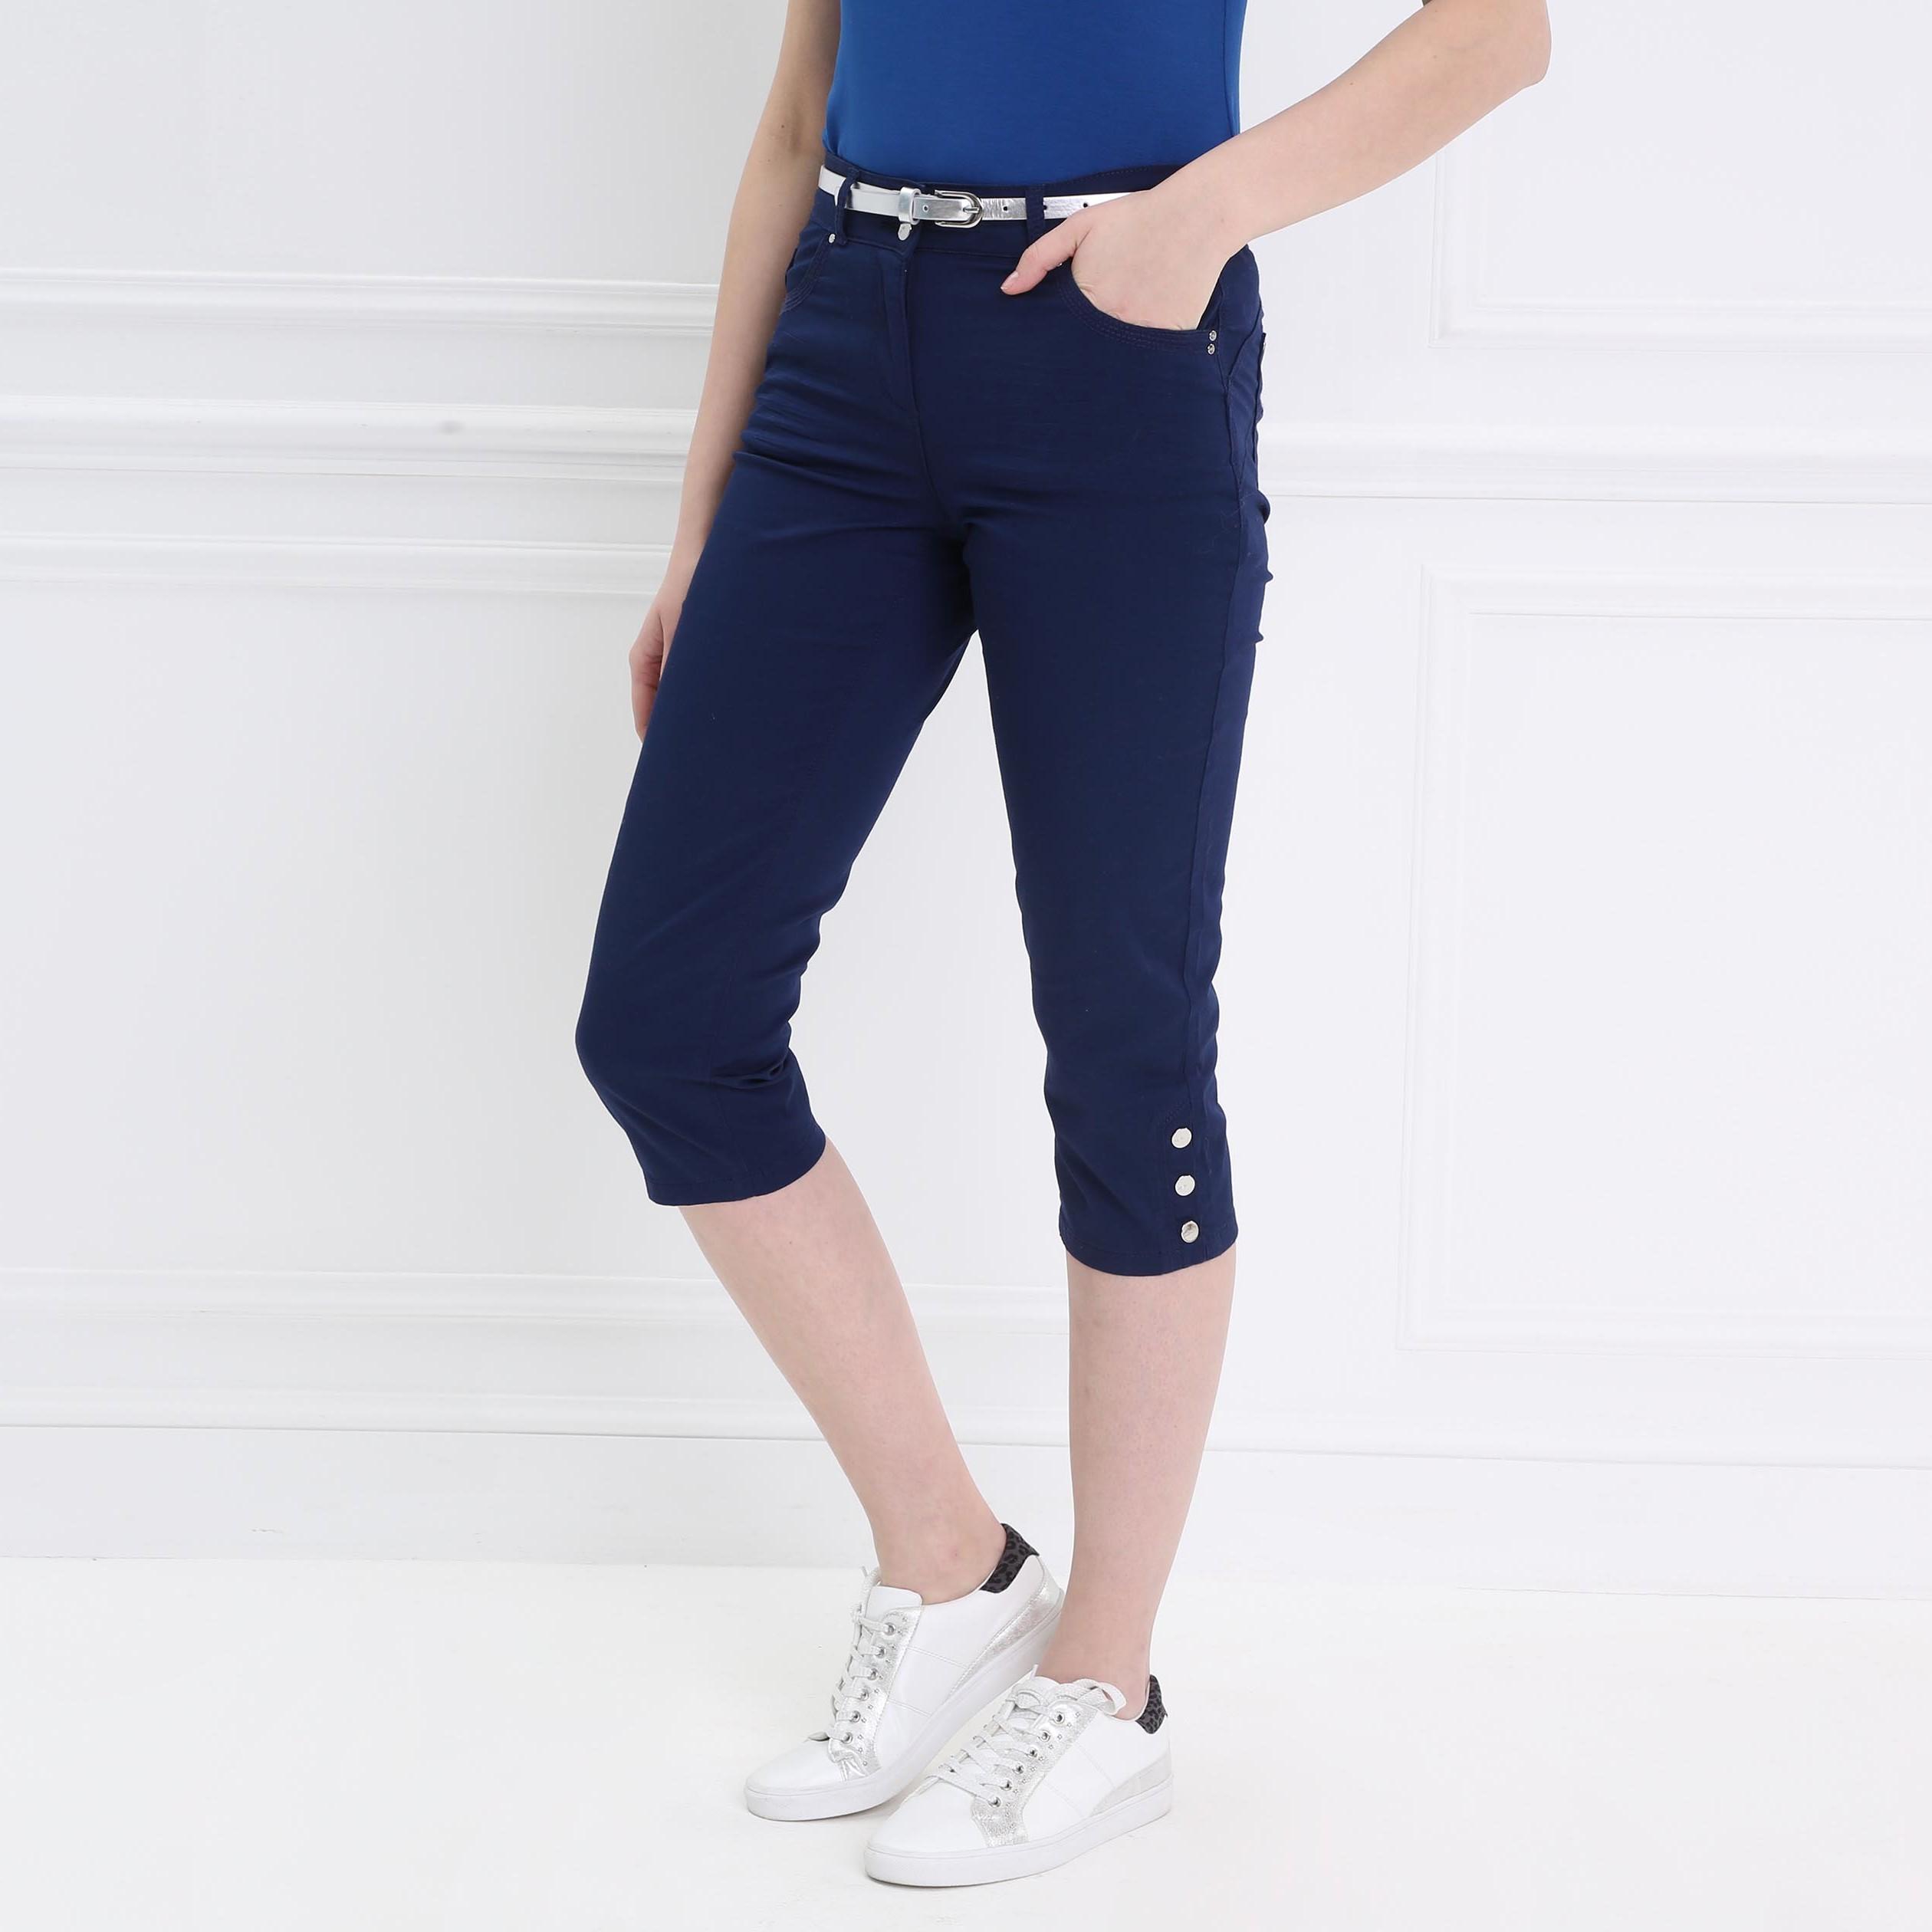 corto ajustable Pantalón marino con para corsario azul mujer ajustado 3T1lc5KuFJ